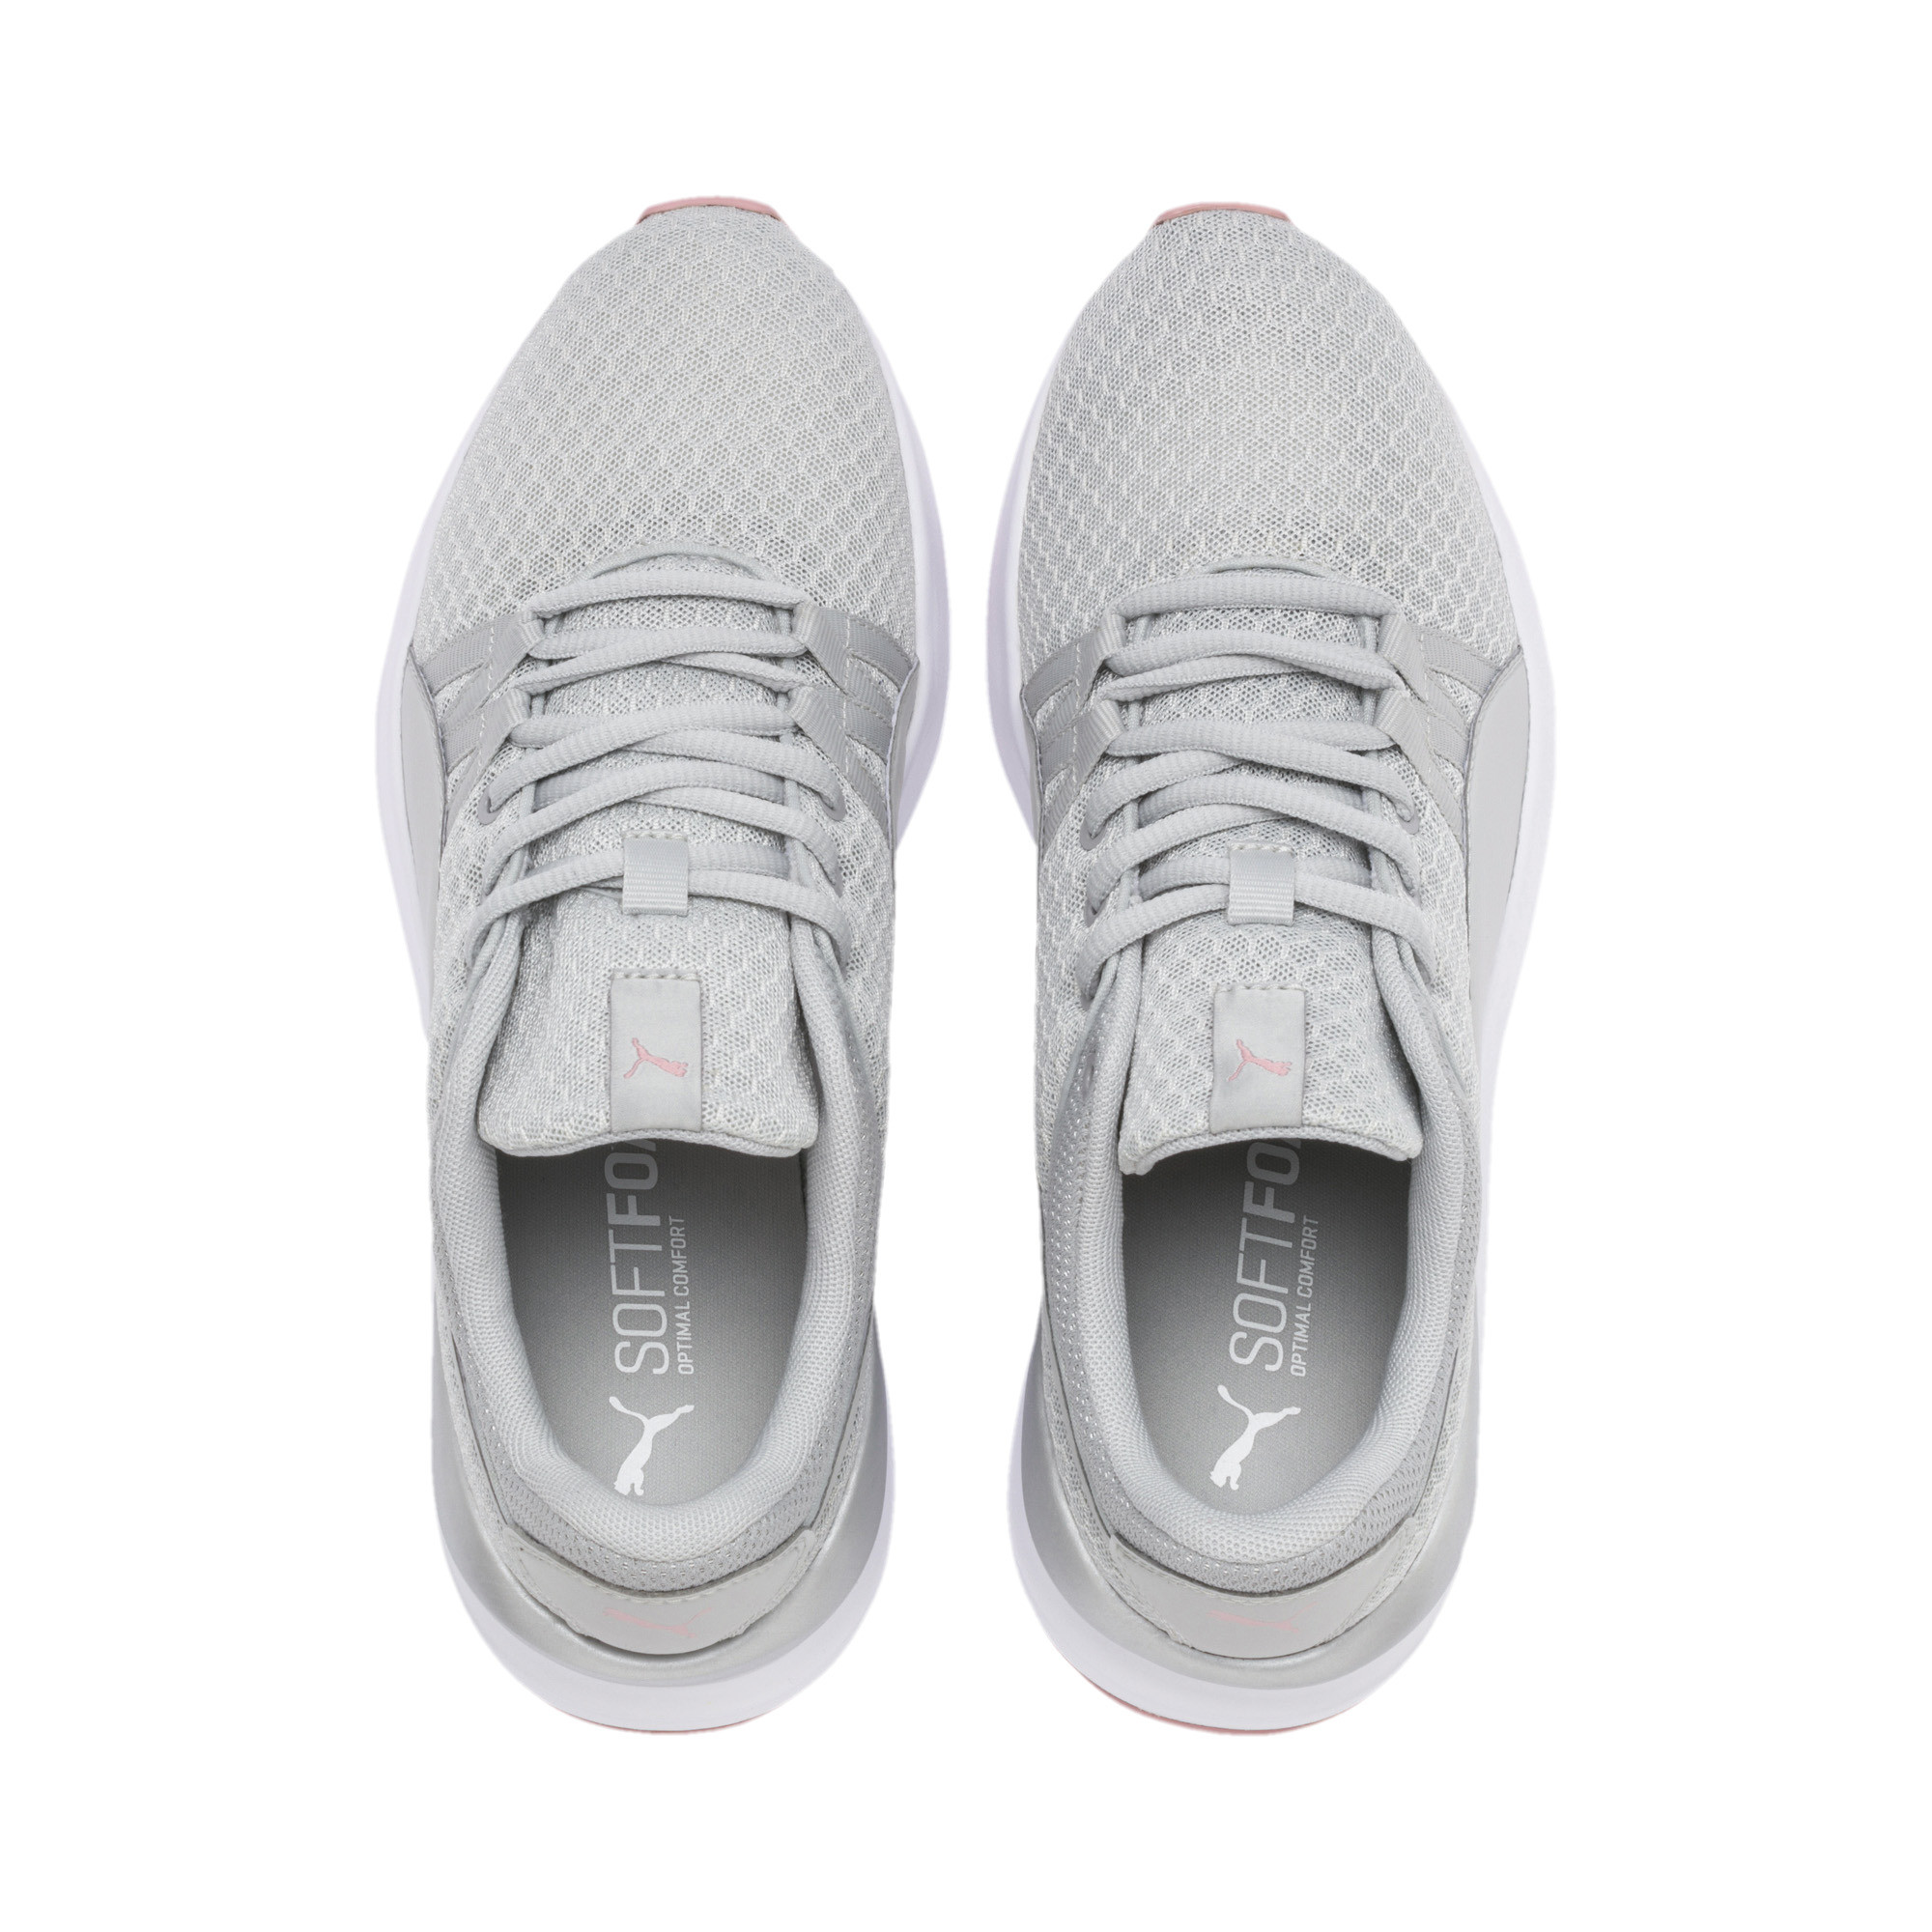 PUMA-Adela-Core-Women-s-Sneakers-Women-Shoe-Basics thumbnail 15